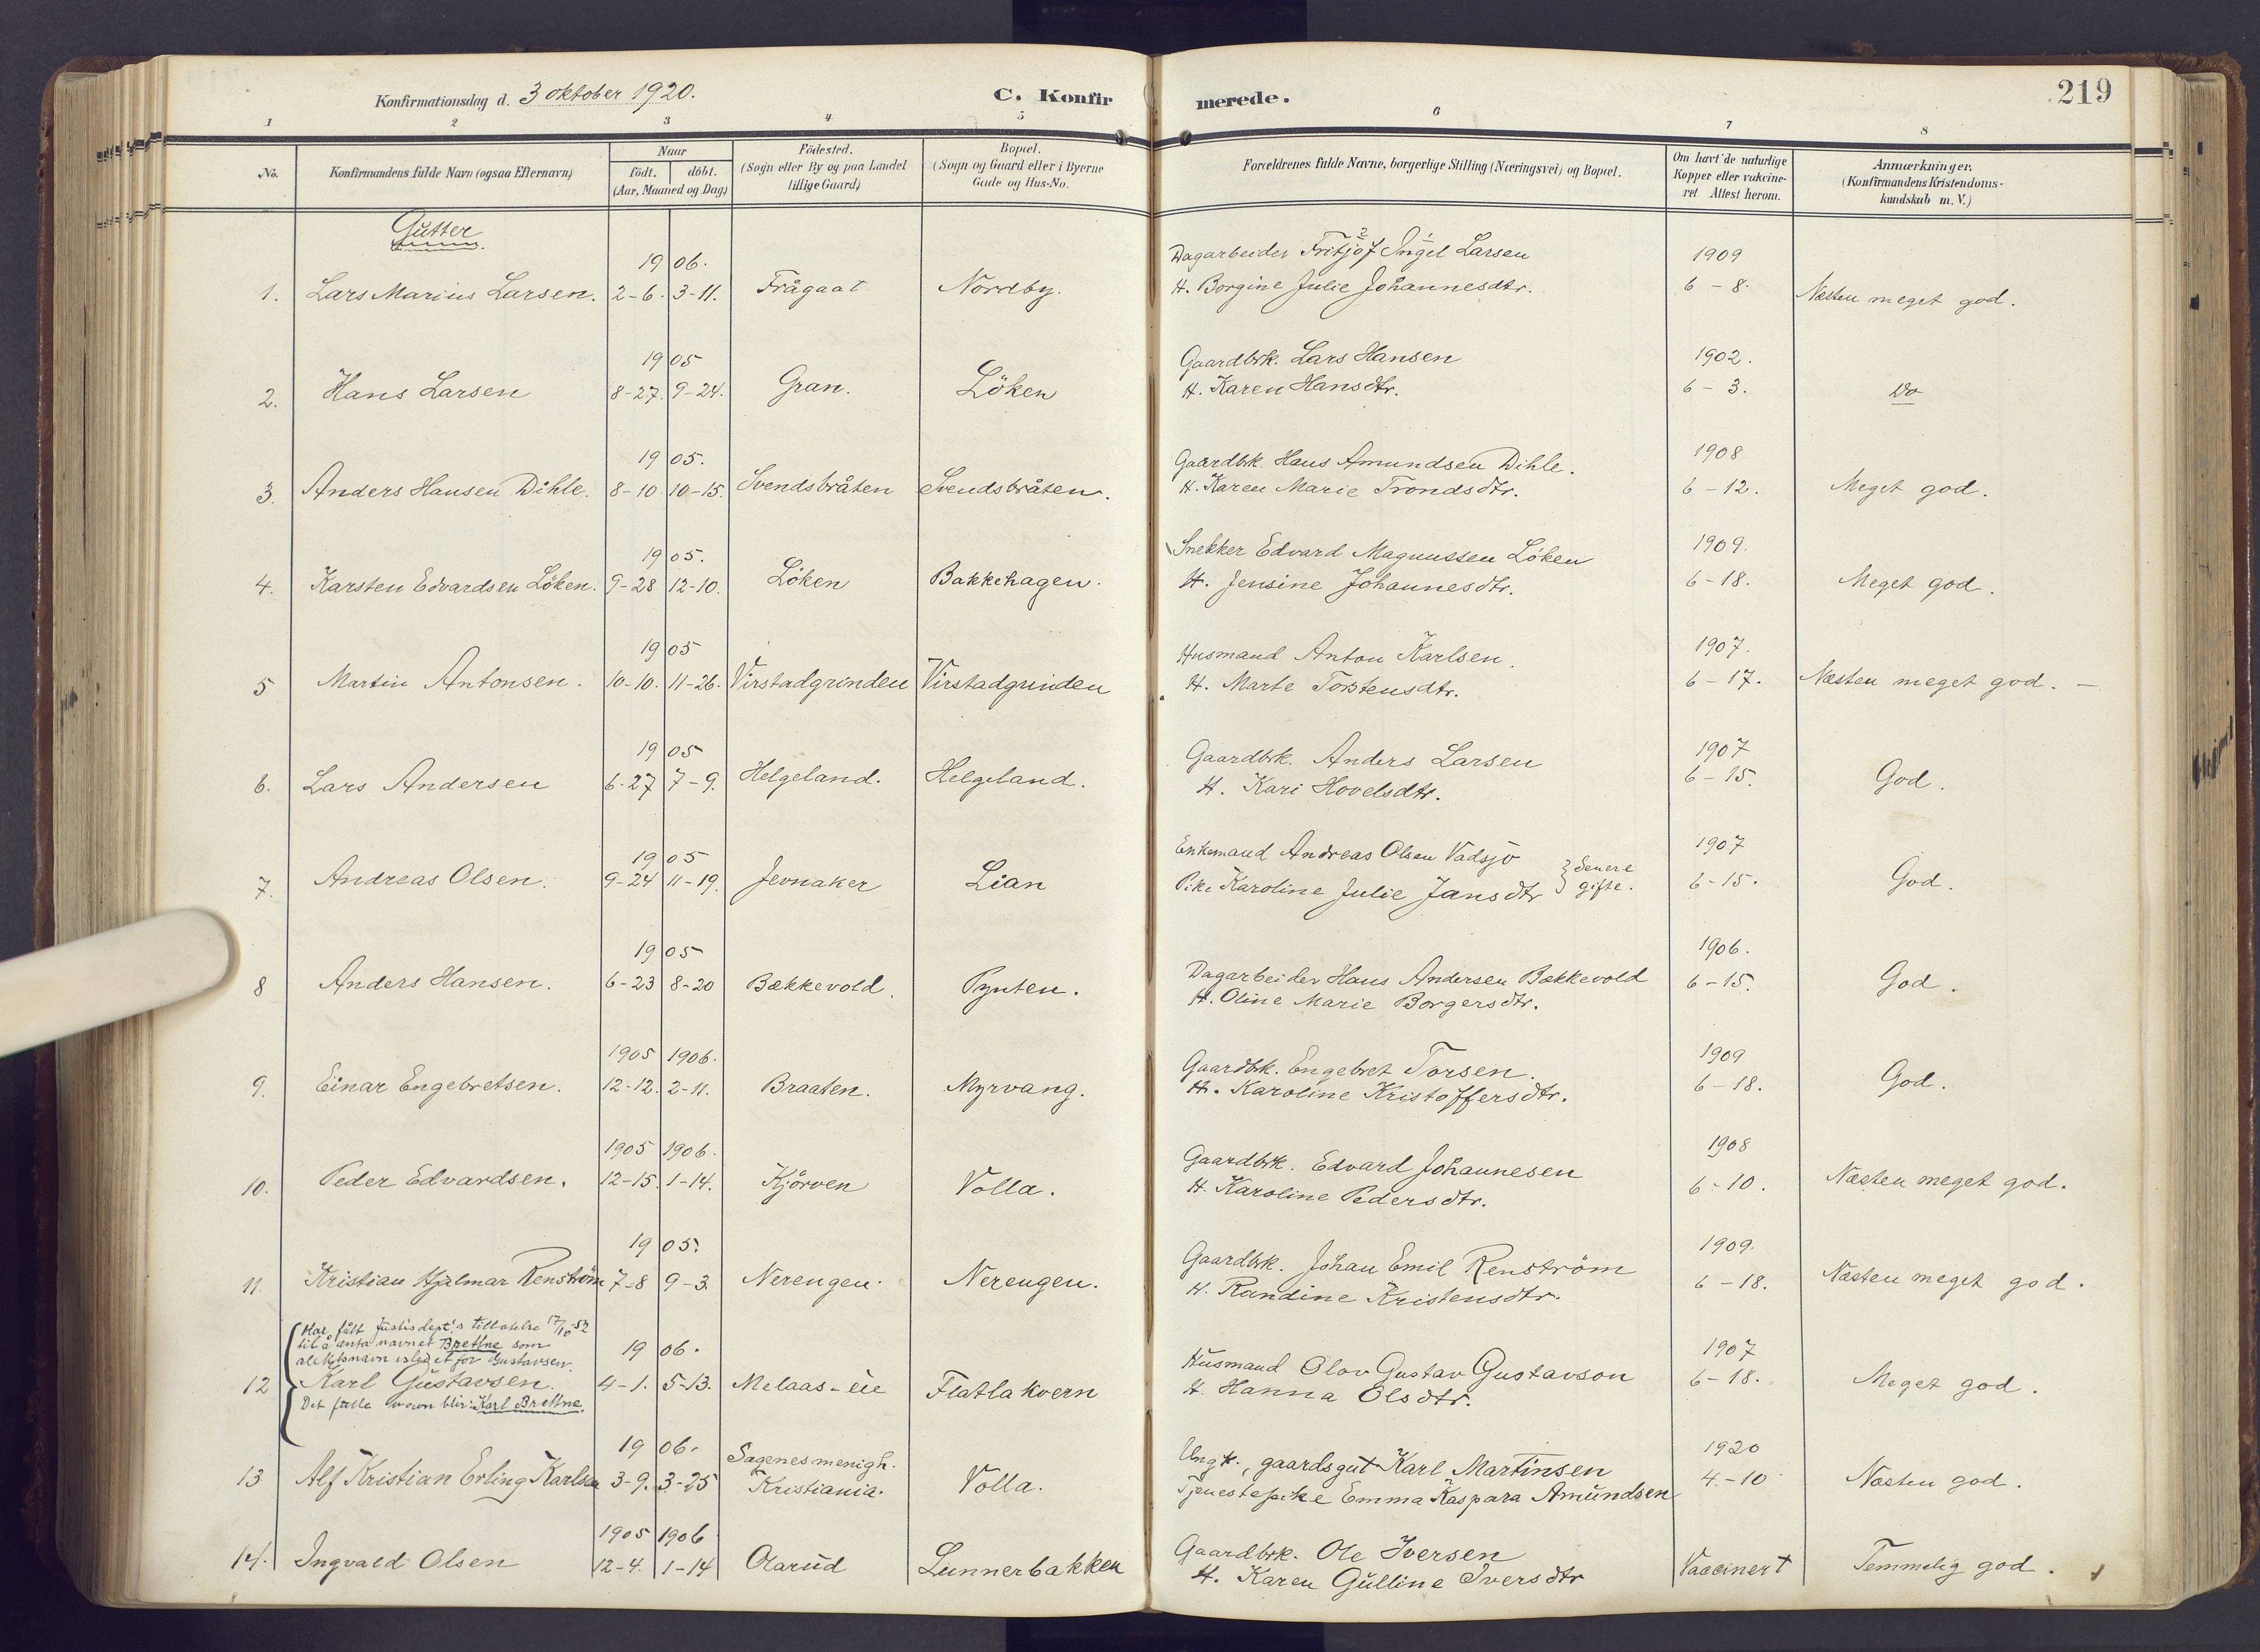 SAH, Lunner prestekontor, H/Ha/Haa/L0001: Ministerialbok nr. 1, 1907-1922, s. 219